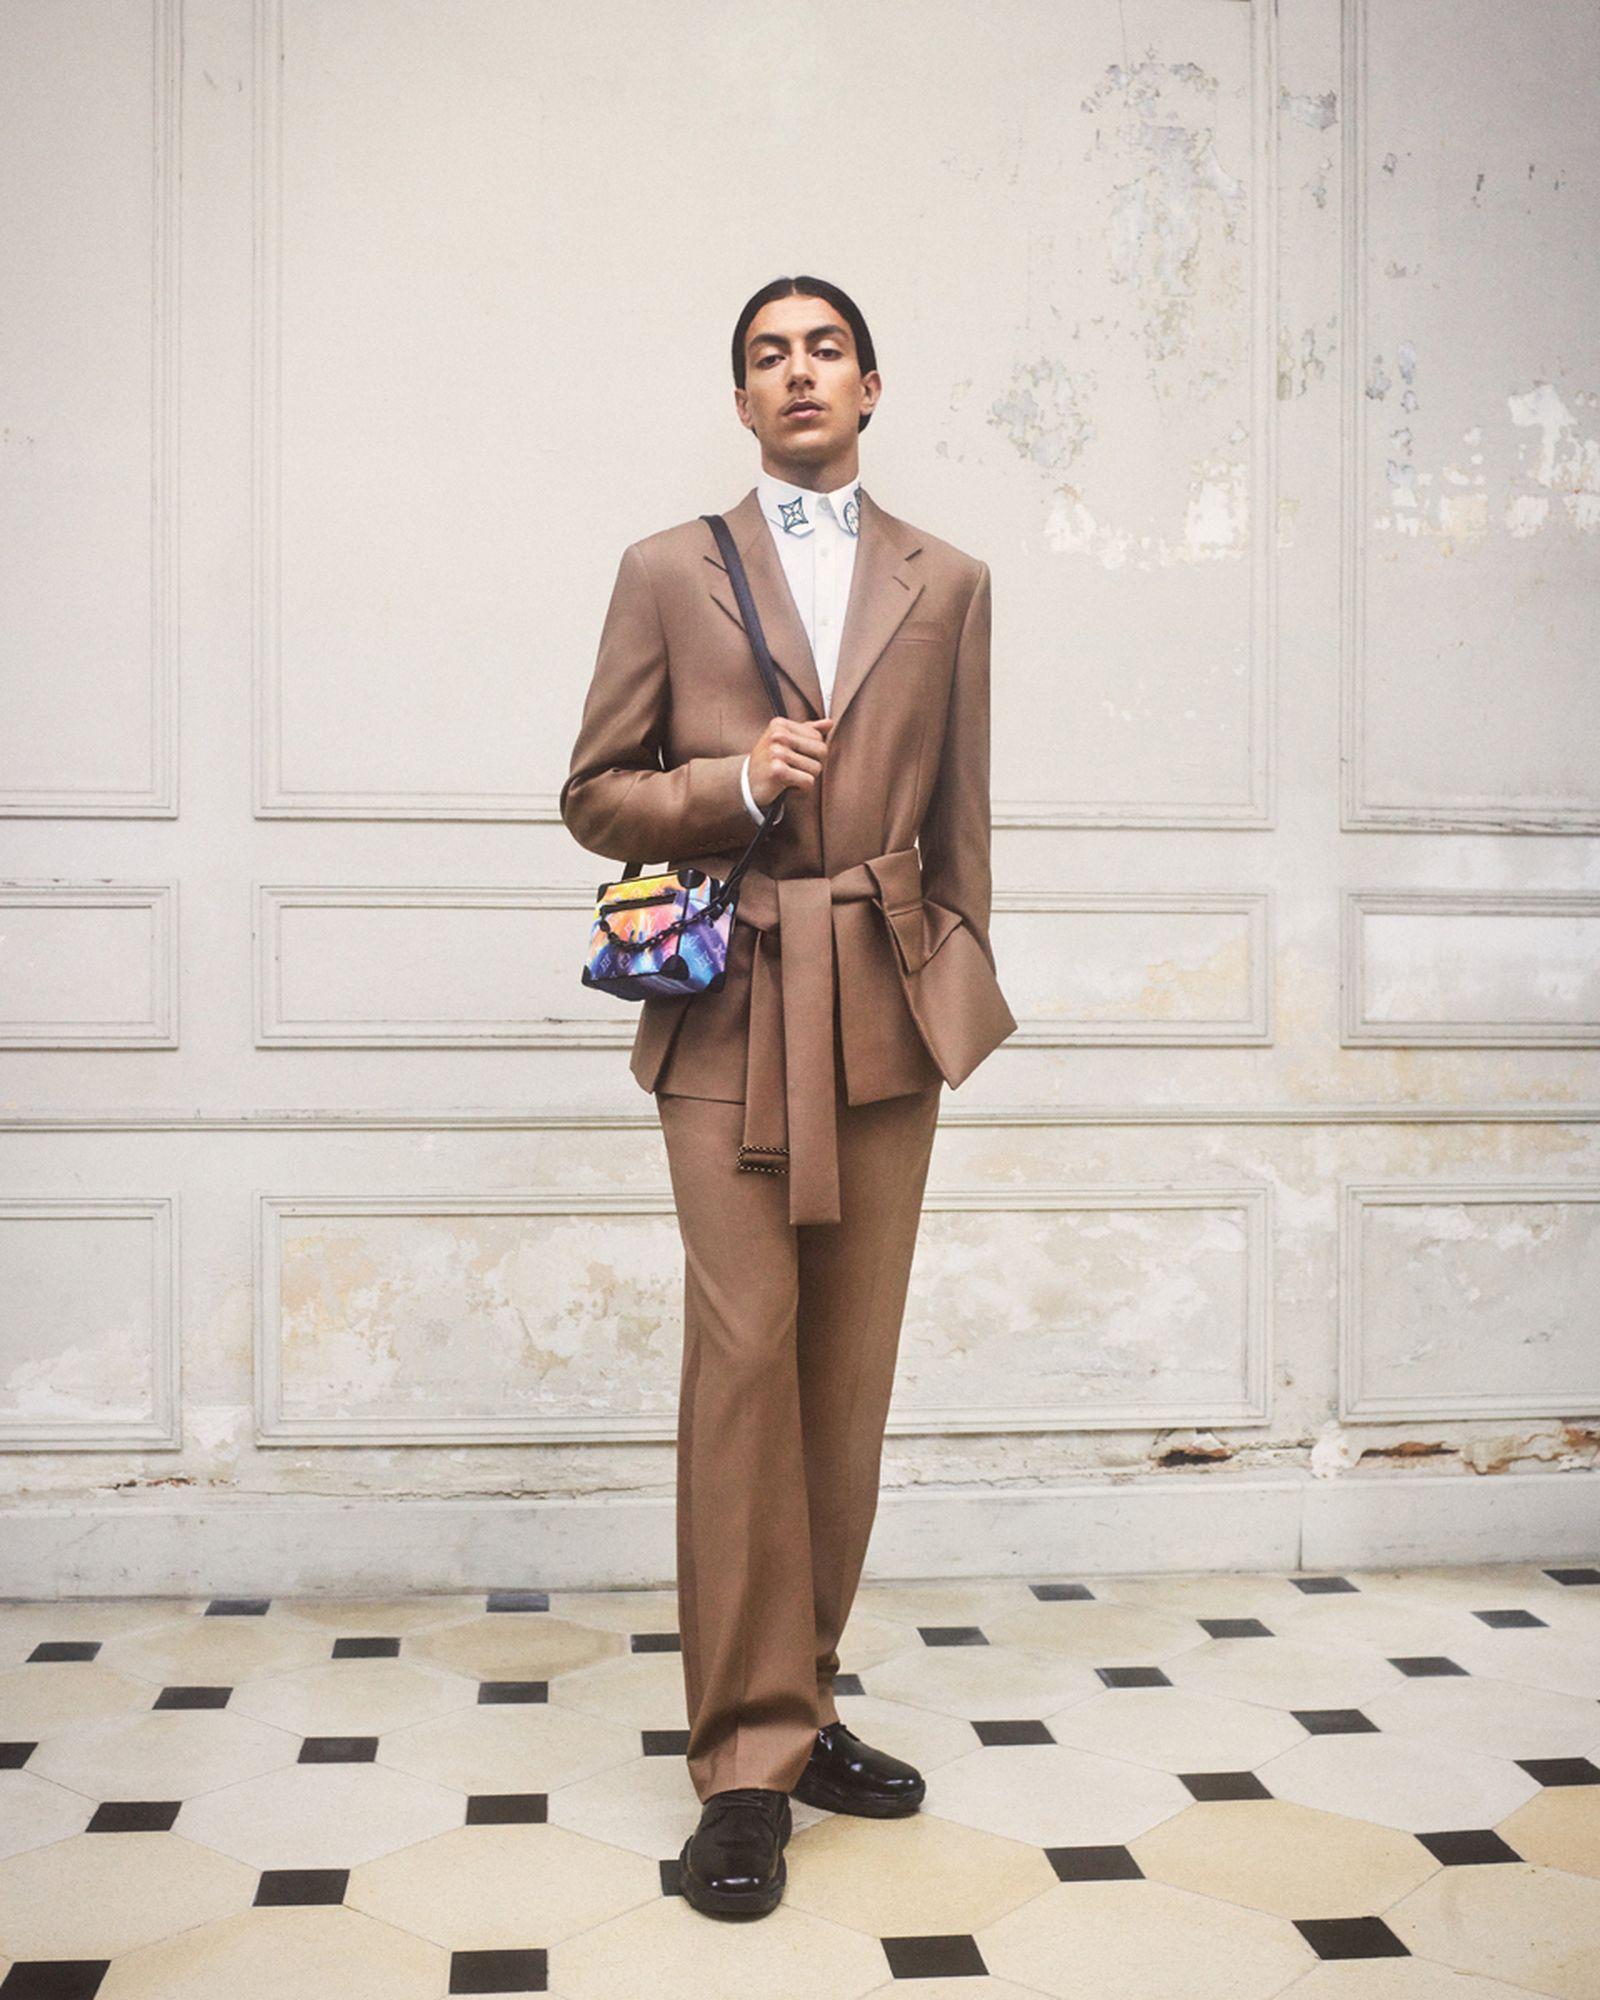 louis vuitton fall 2021 menswear virgil abloh collection campaign